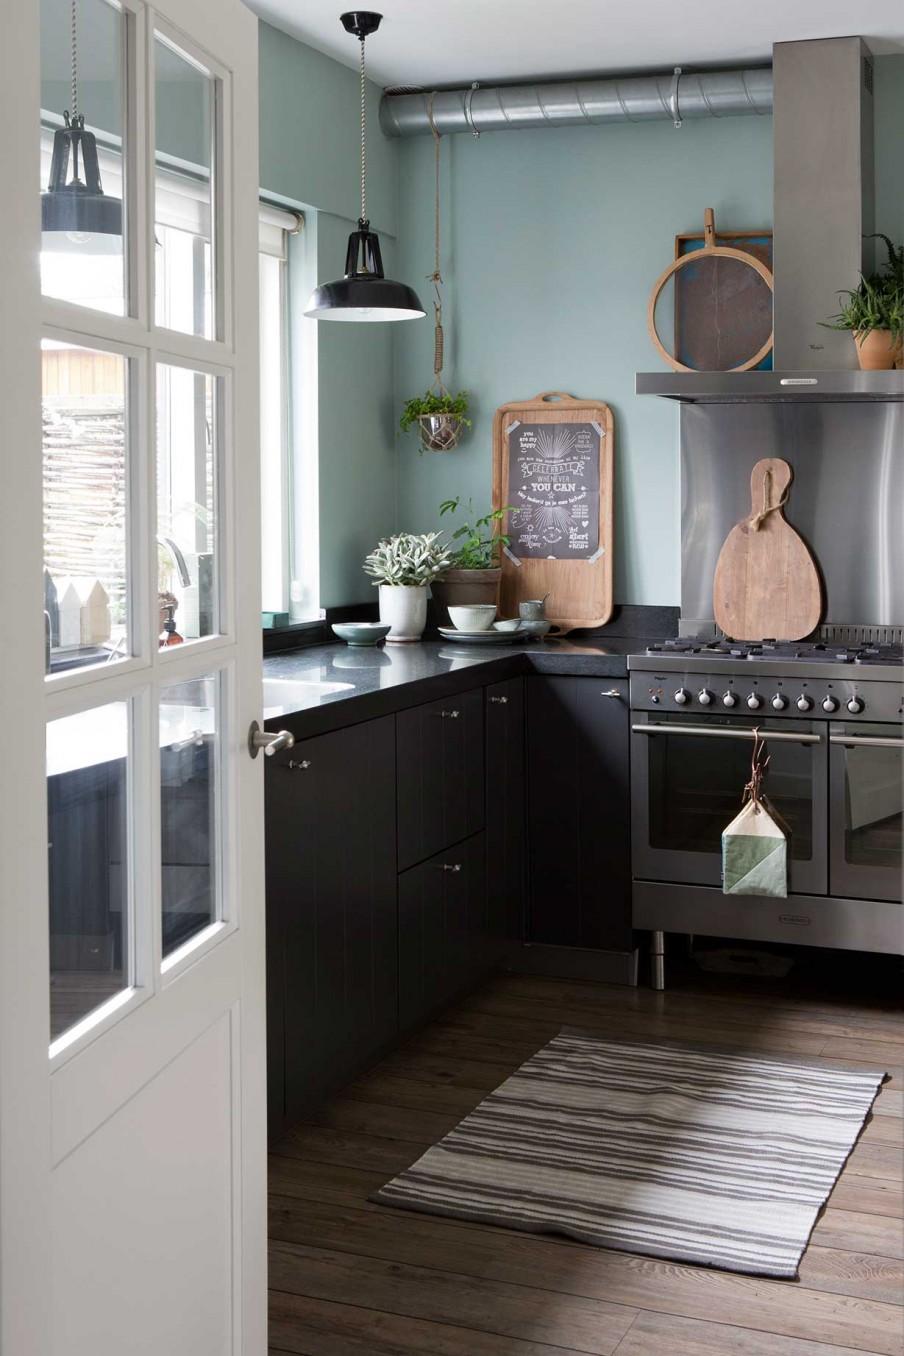 cuisine-four-maison-deco-scandinave-brocante-liliinwonderland